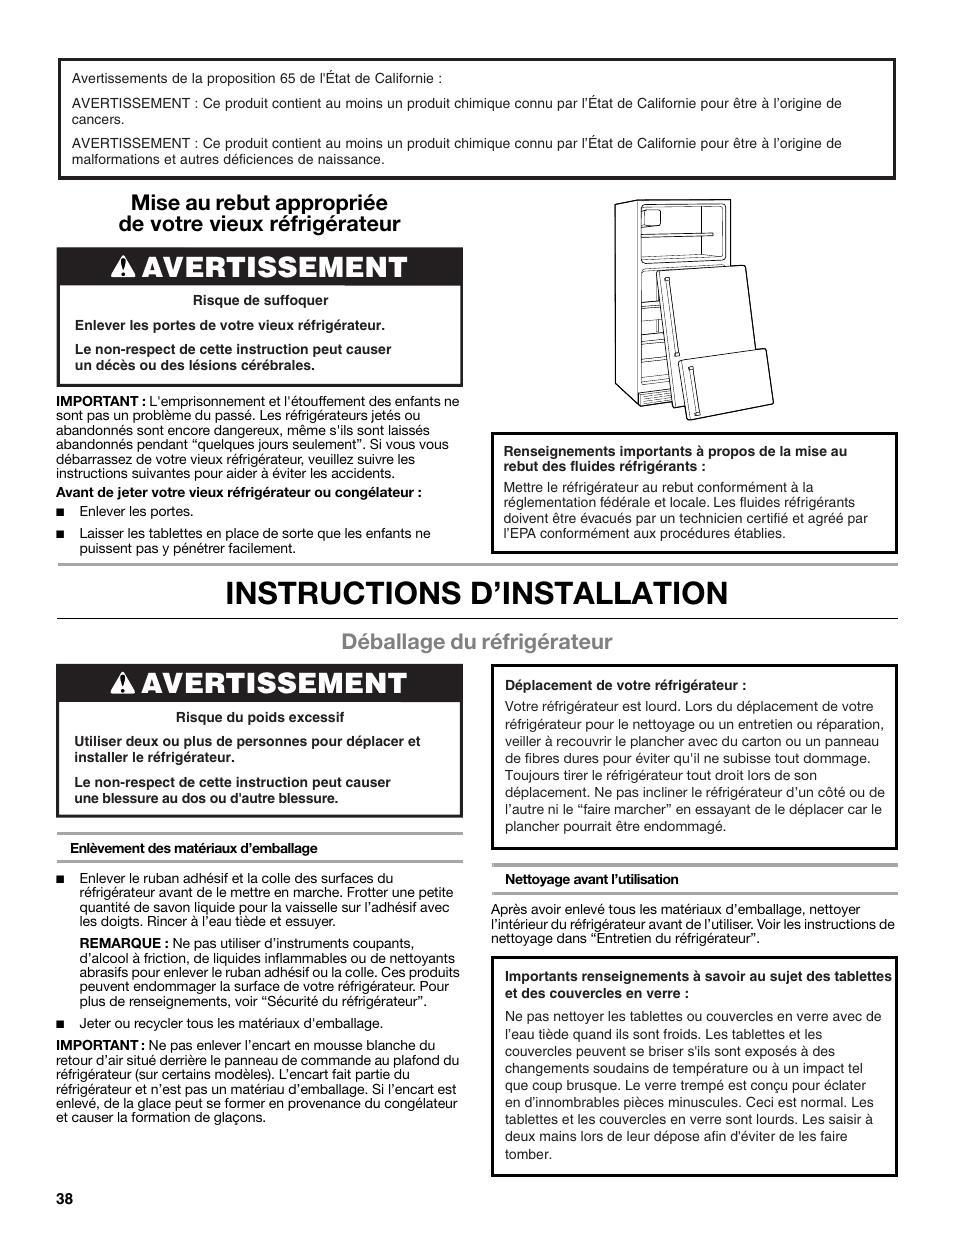 Whirlpool refrigerator replace defrost control board #w10366605.